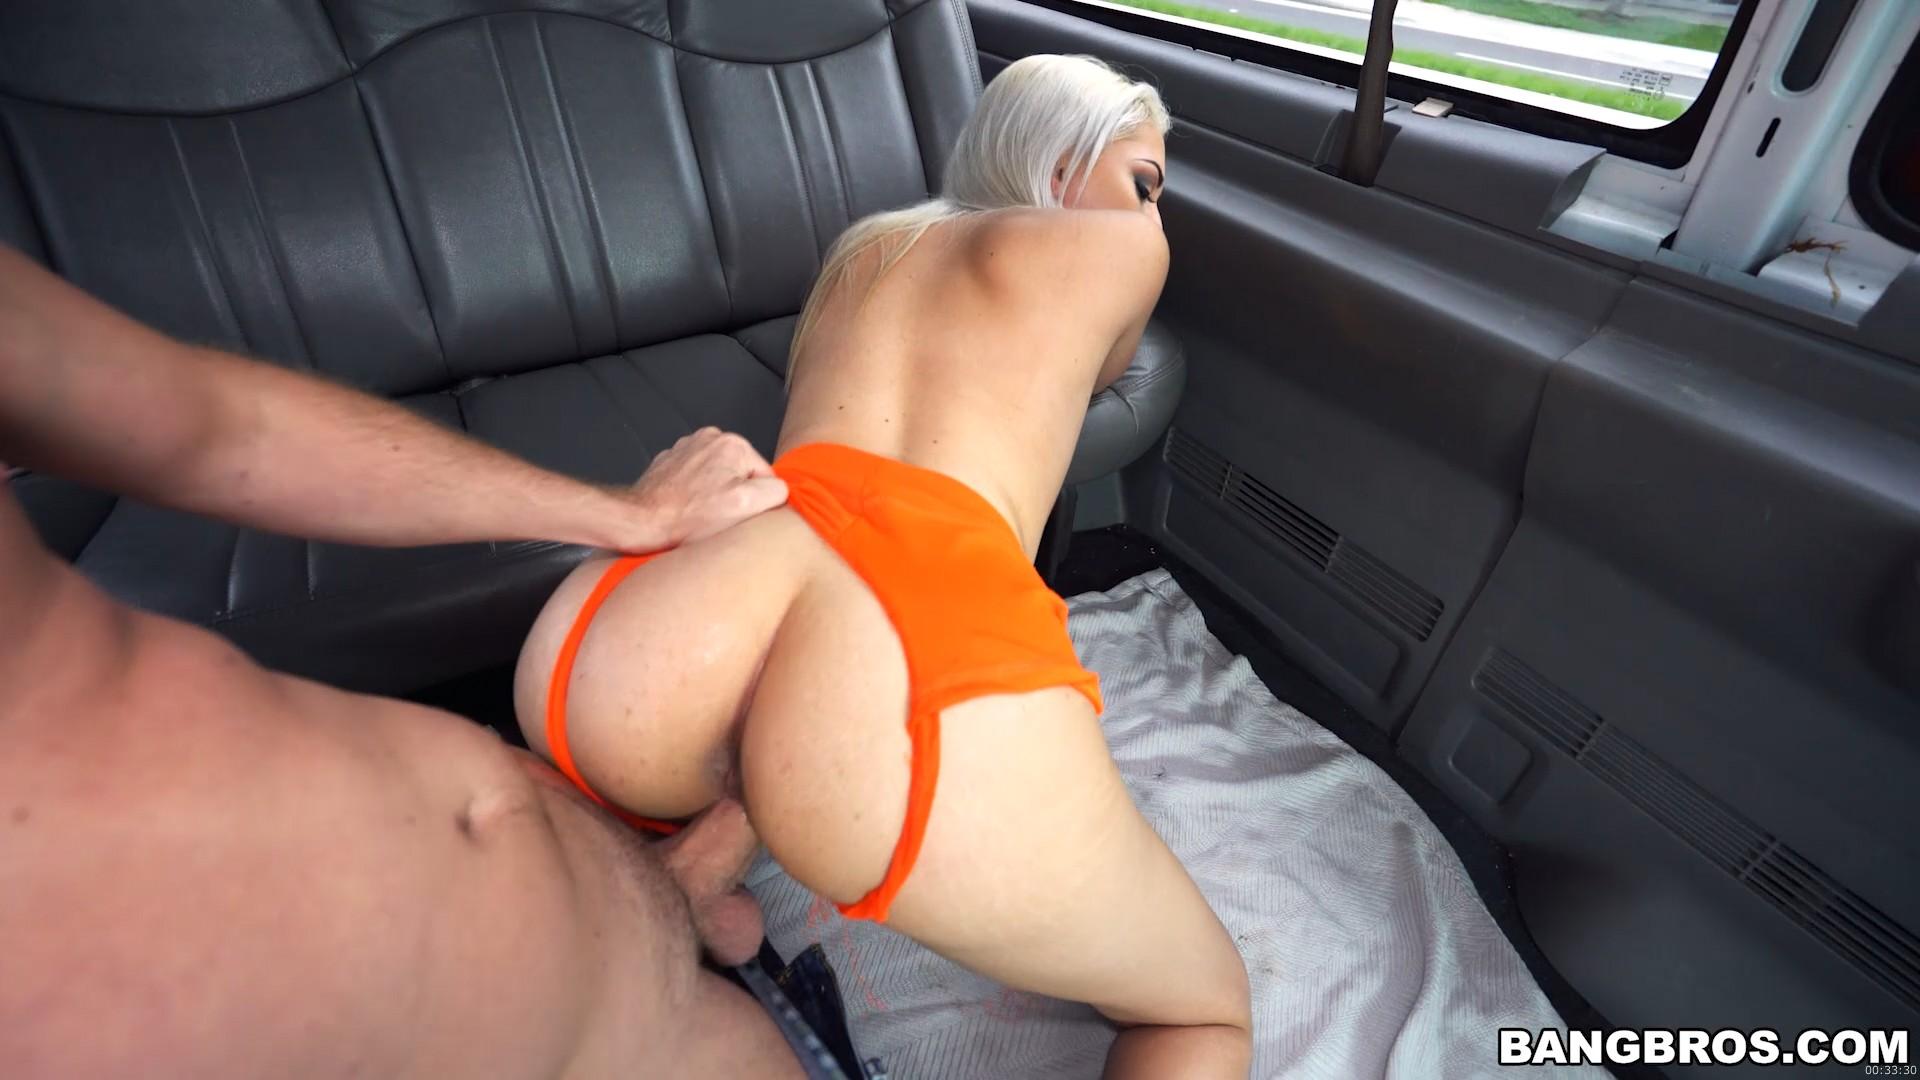 29d13e bangbros 2017-06-21 Blonde Dumped & Splashed